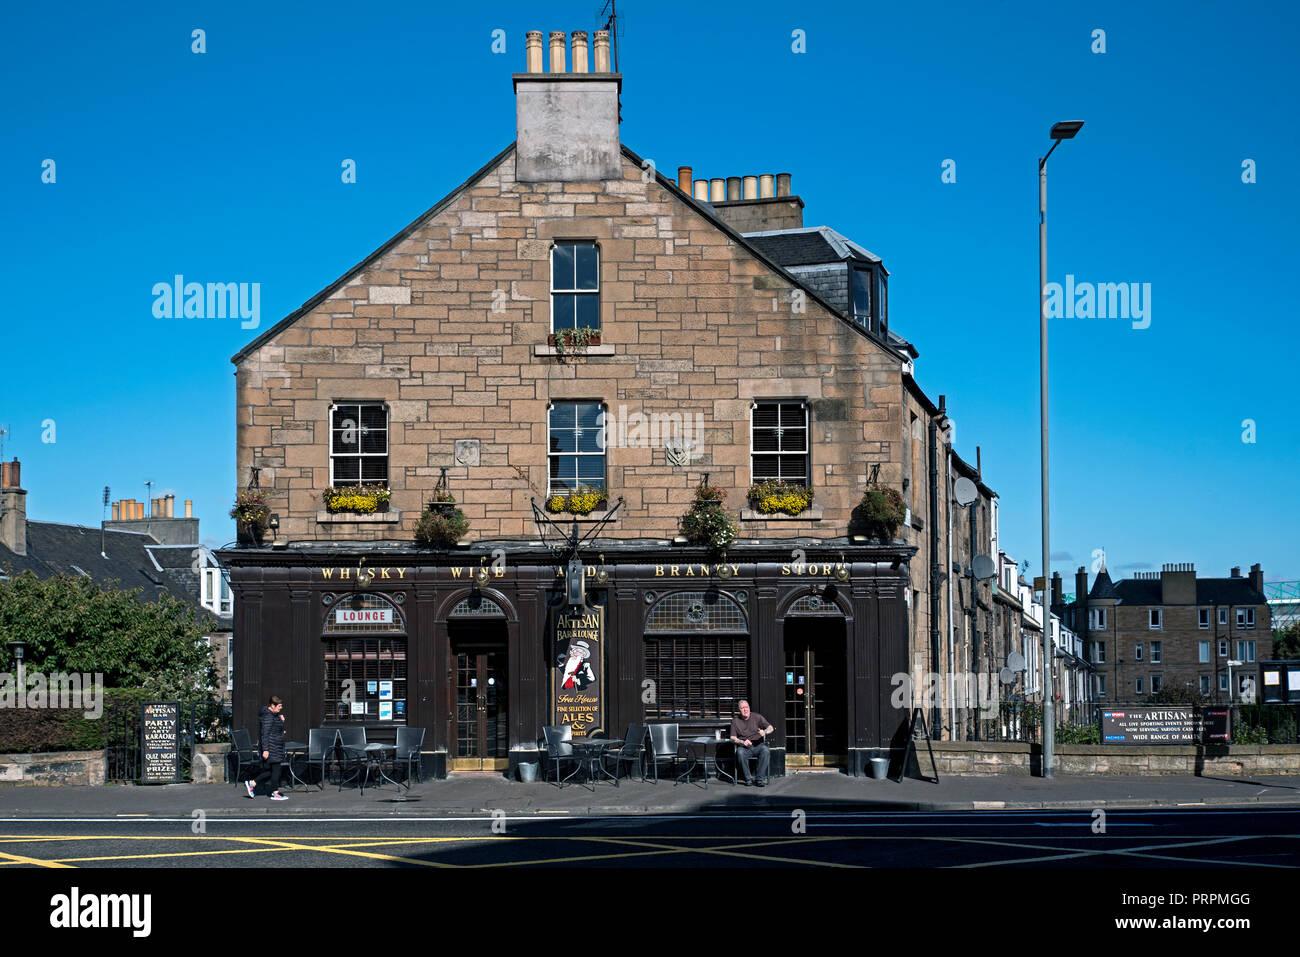 A single customer enjoys the sunshine outside the Artisan Bar on London Road, Edinburgh, Scotland, UK. - Stock Image